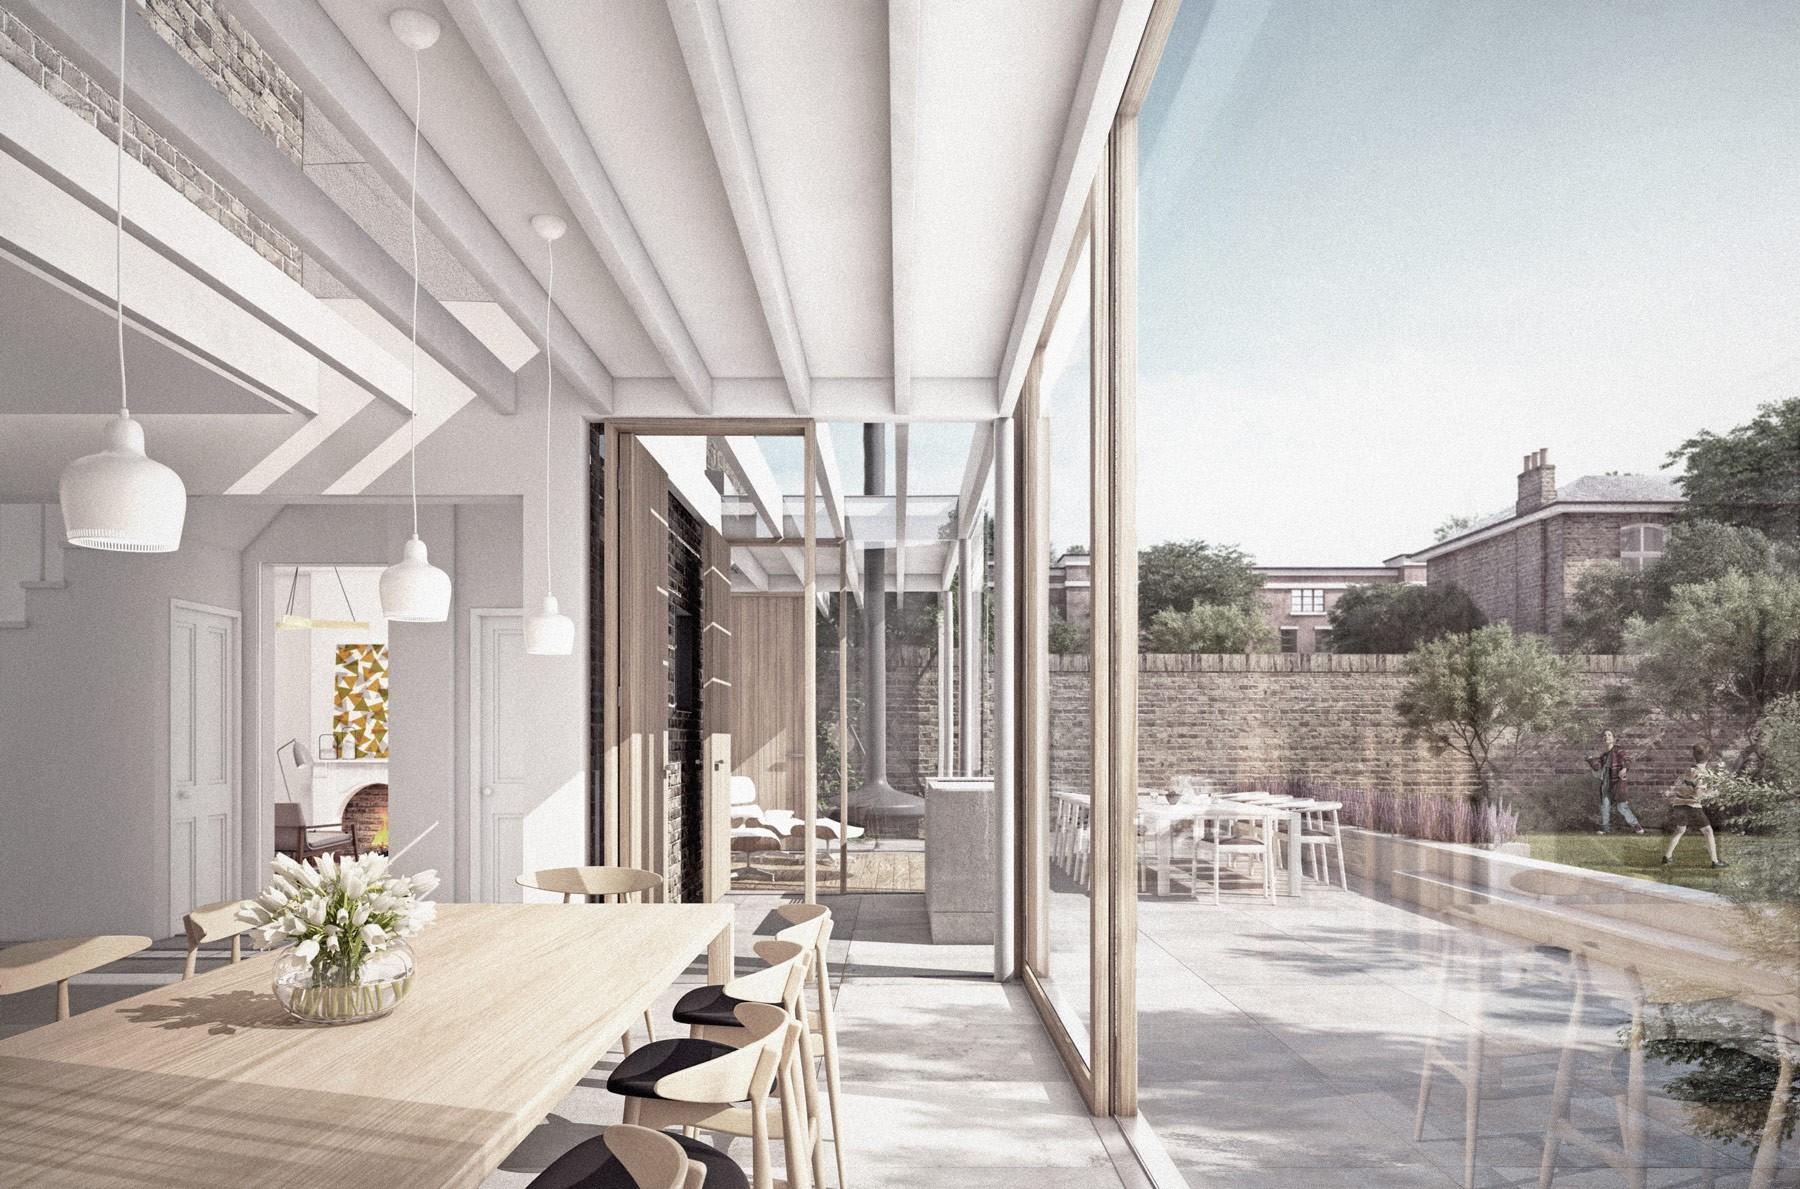 Camden architects: Dartmouth Park house extension